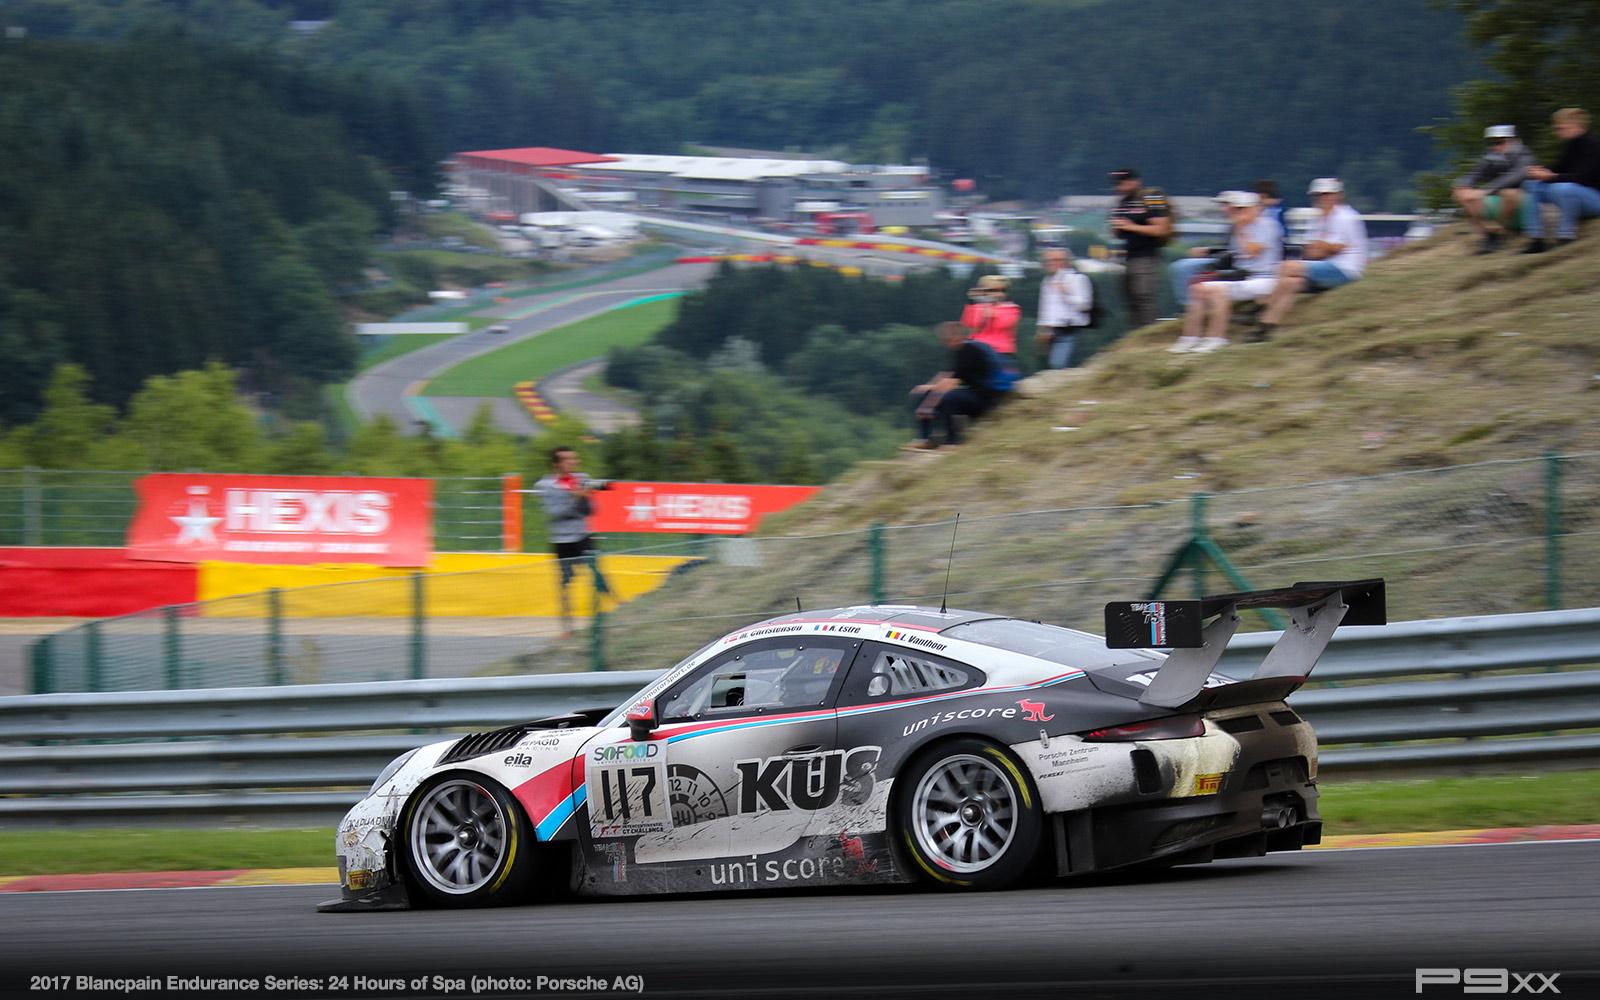 2017-24-Hours-of-Spa-Porsche-380